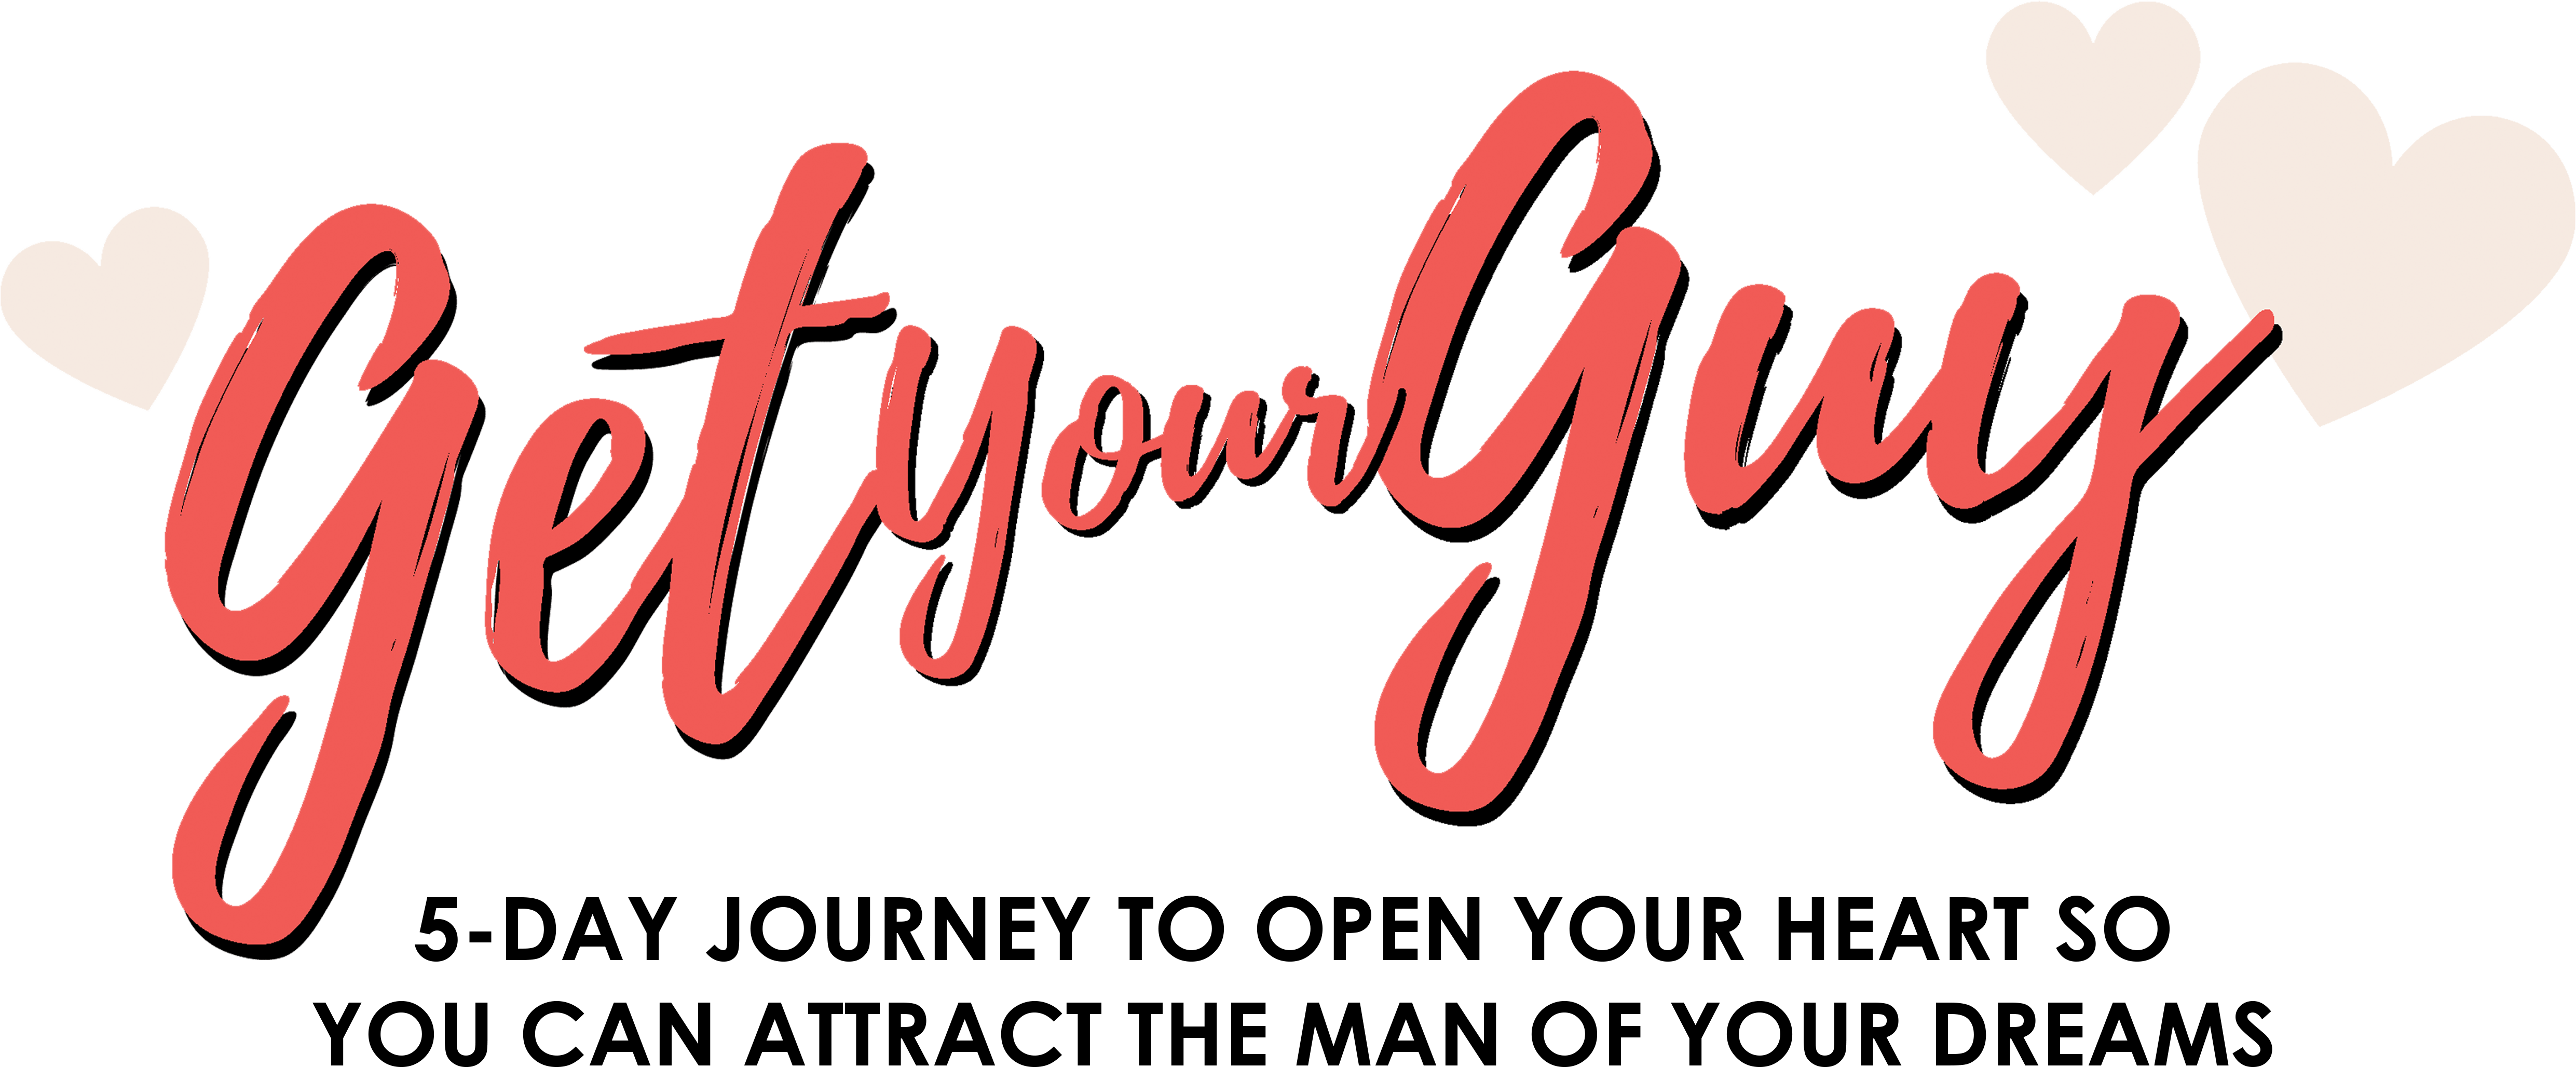 Get Your Guy: 5 Day Journey with Kim Sarasin